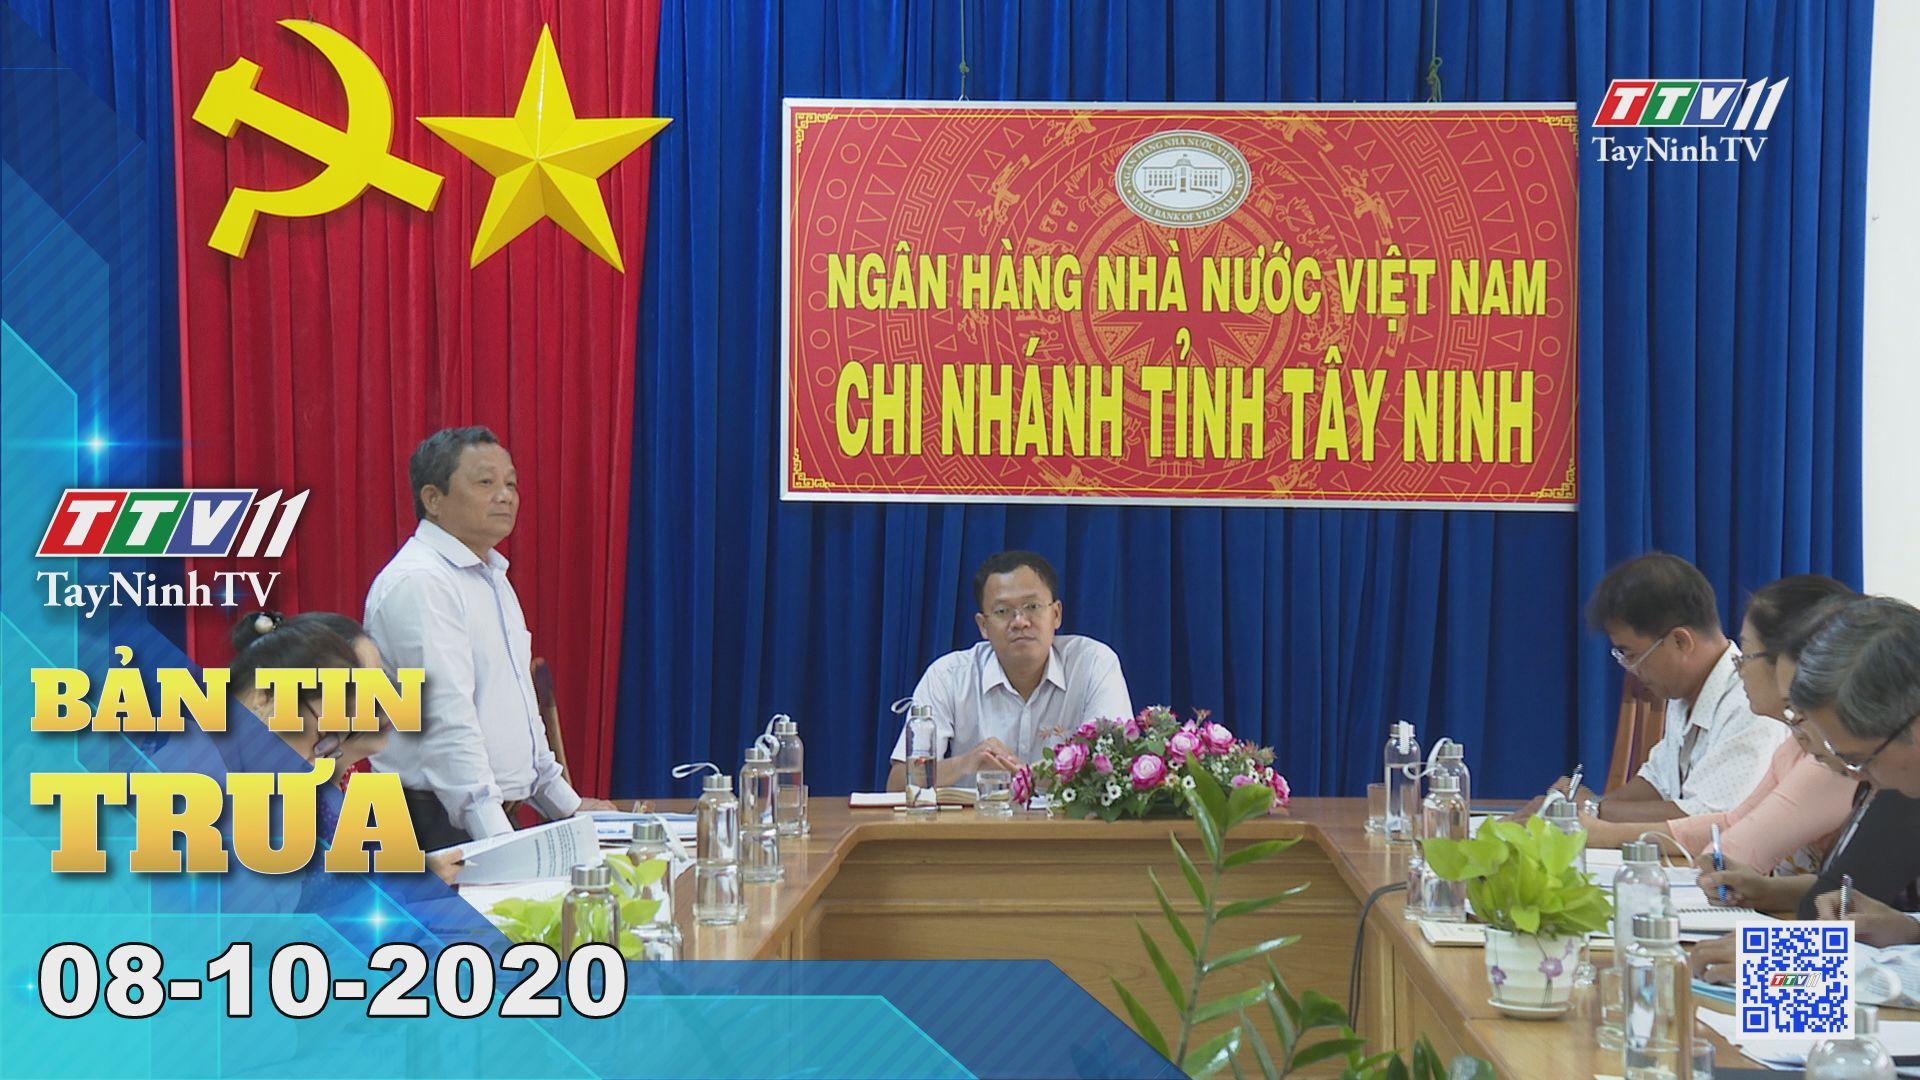 Bản tin trưa 08-10-2020 | Tin tức hôm nay | TayNinhTV